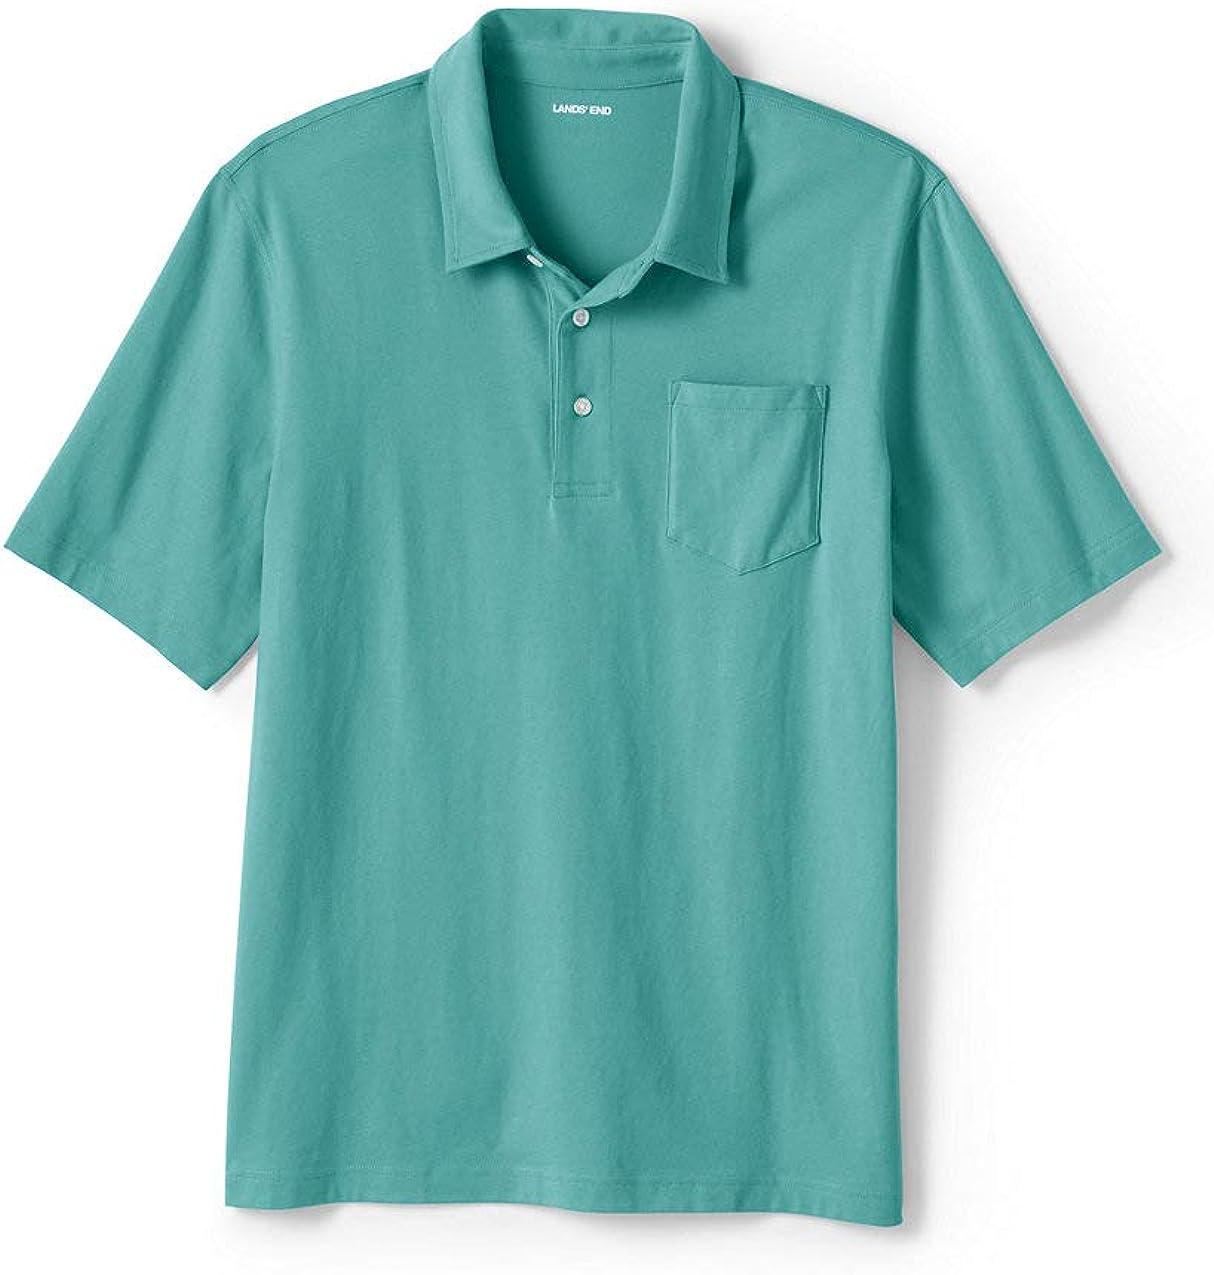 Lands' End Men's Super-T Short Sleeve Polo Shirt